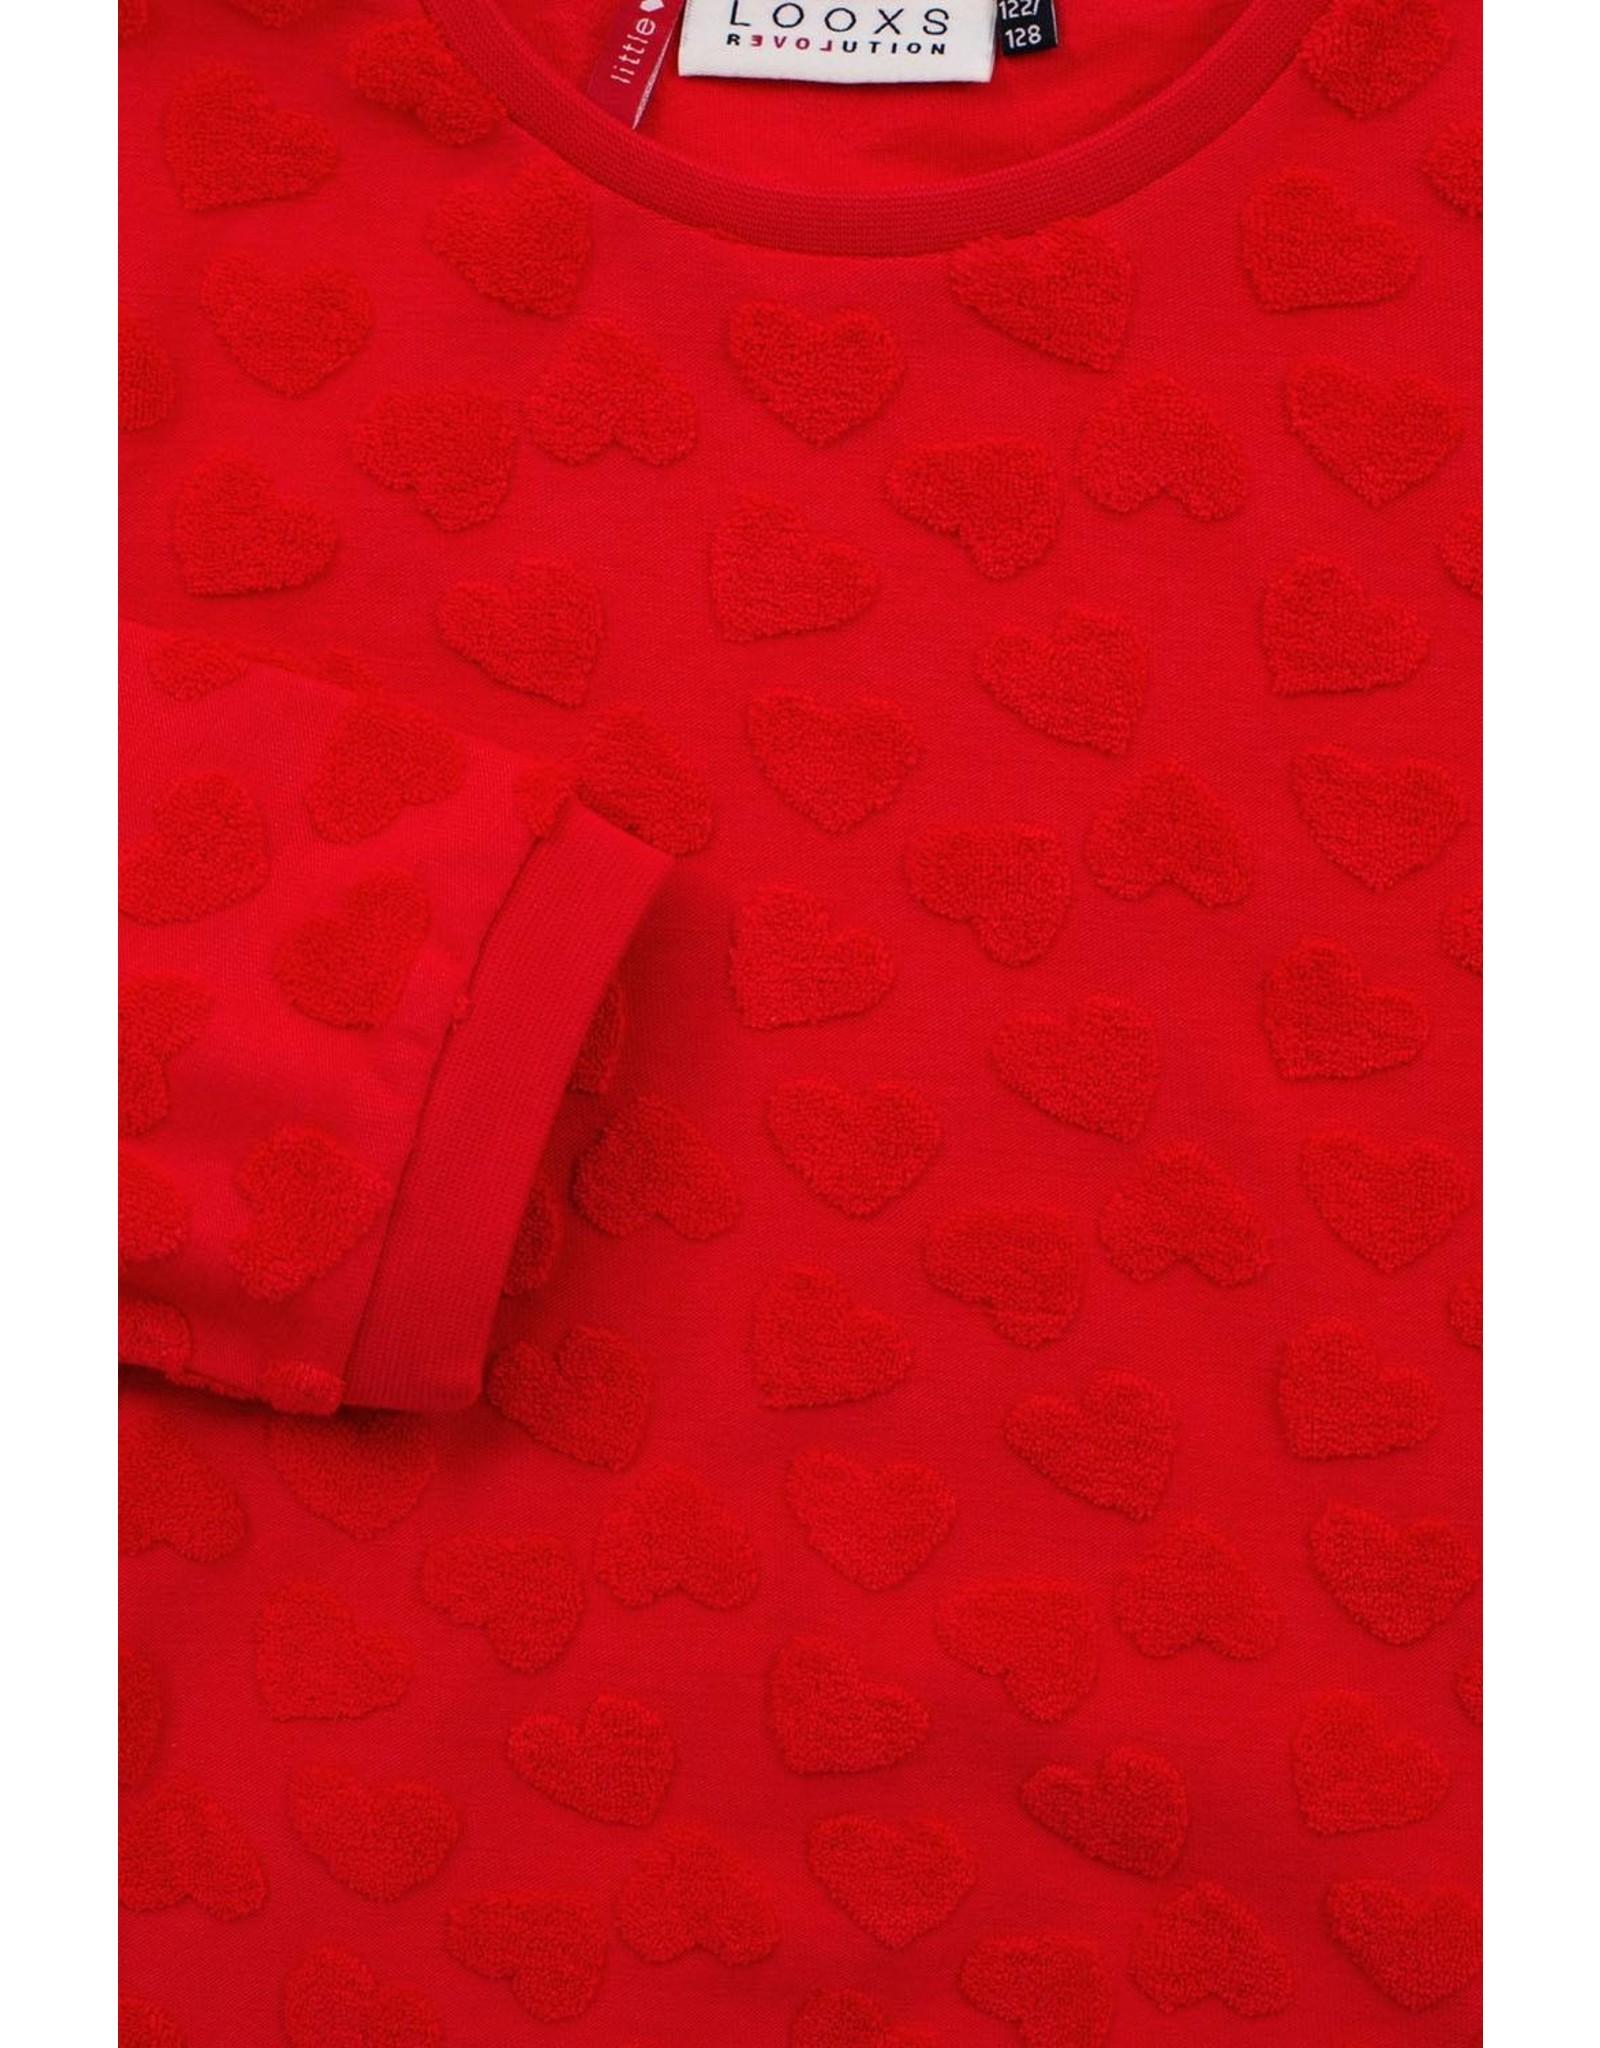 Looxs Little Little sweater 3/4 sleeve red apple